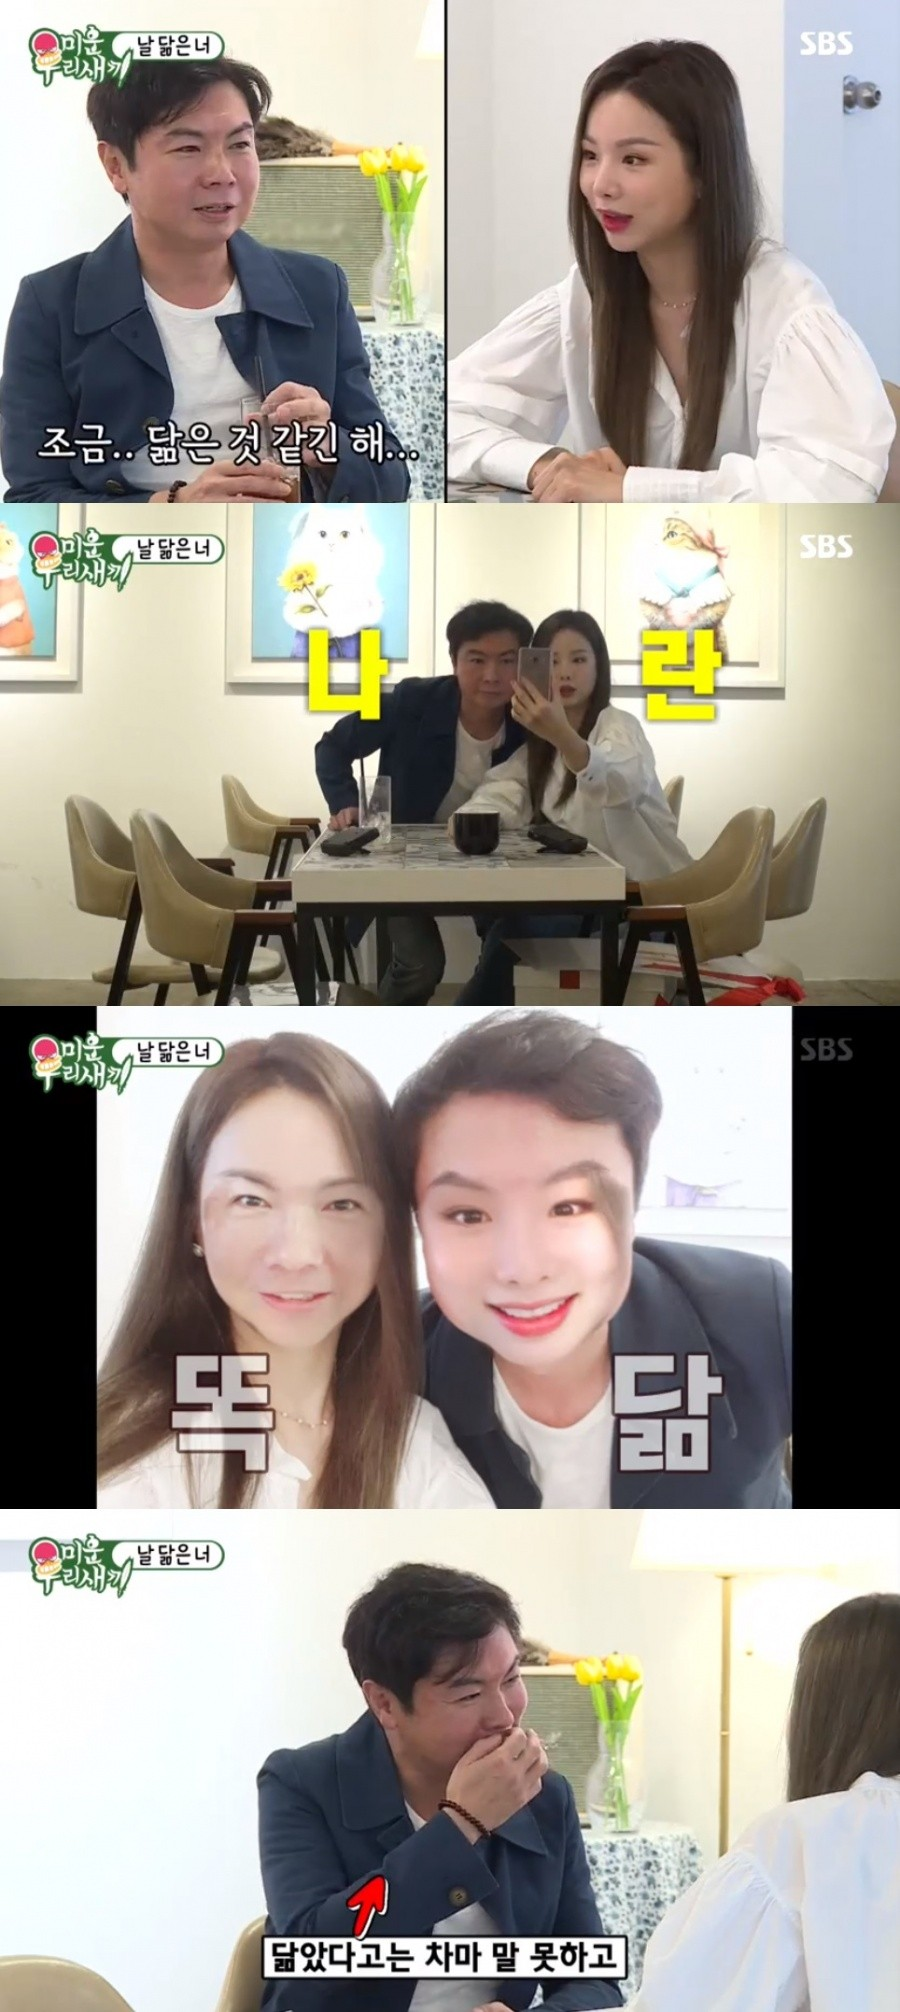 Shin se Kyung dating allkpop